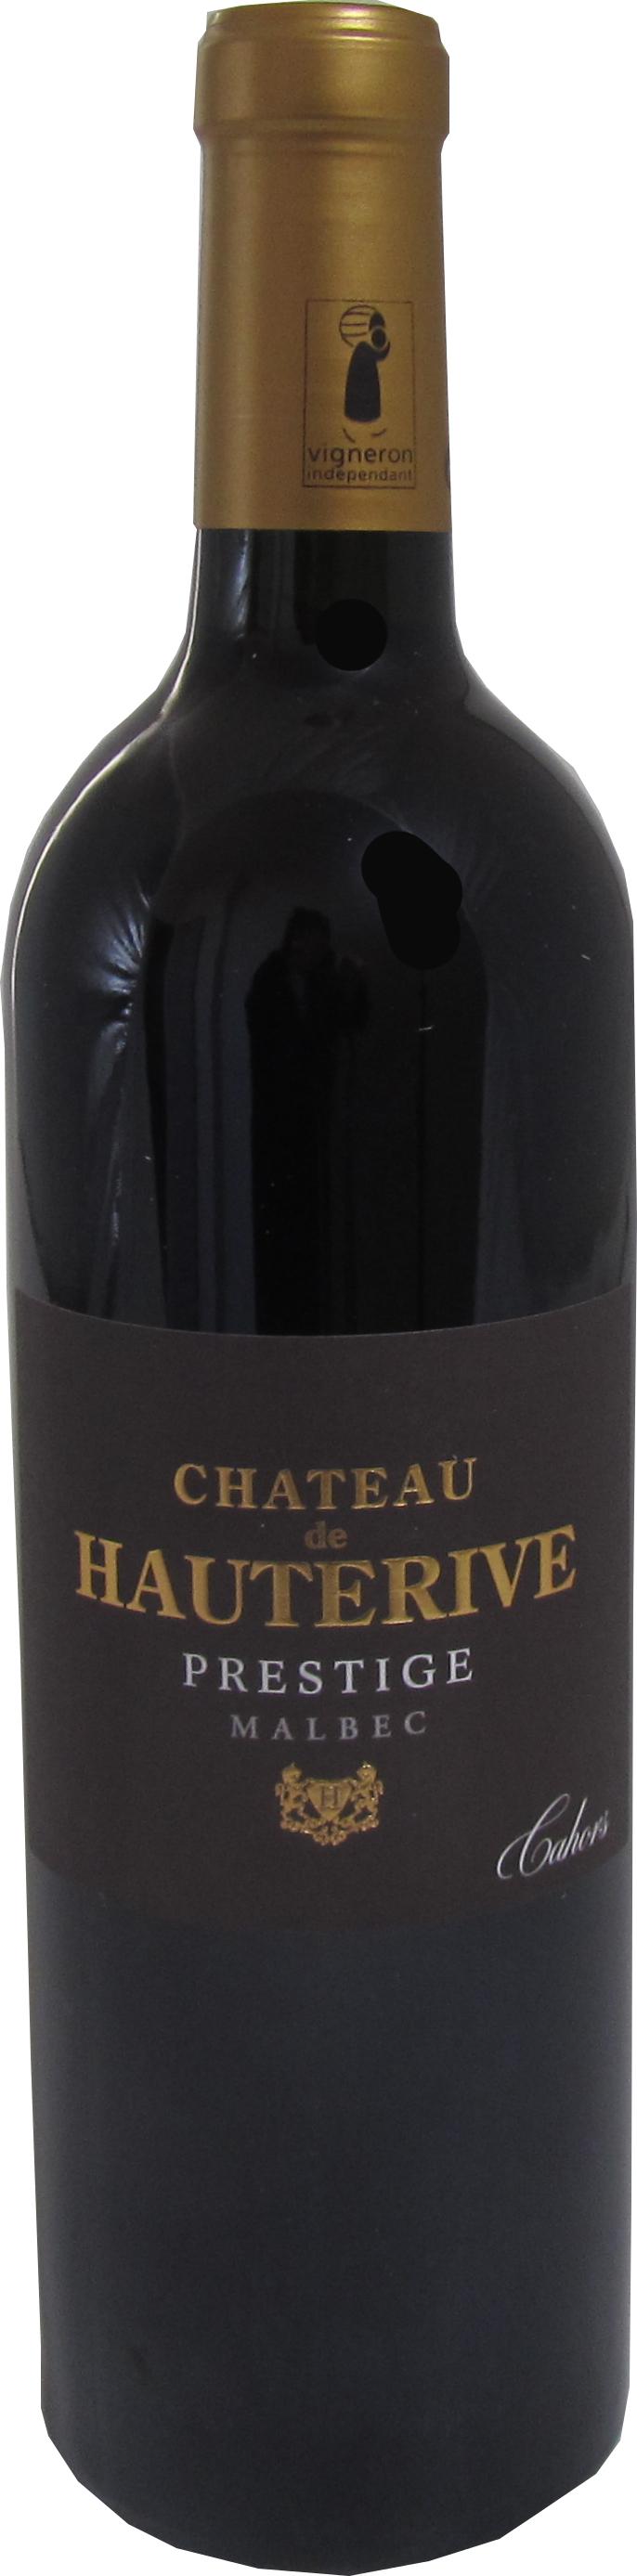 Chateau de Hauterive Cuvee Prestige Cahors 2018